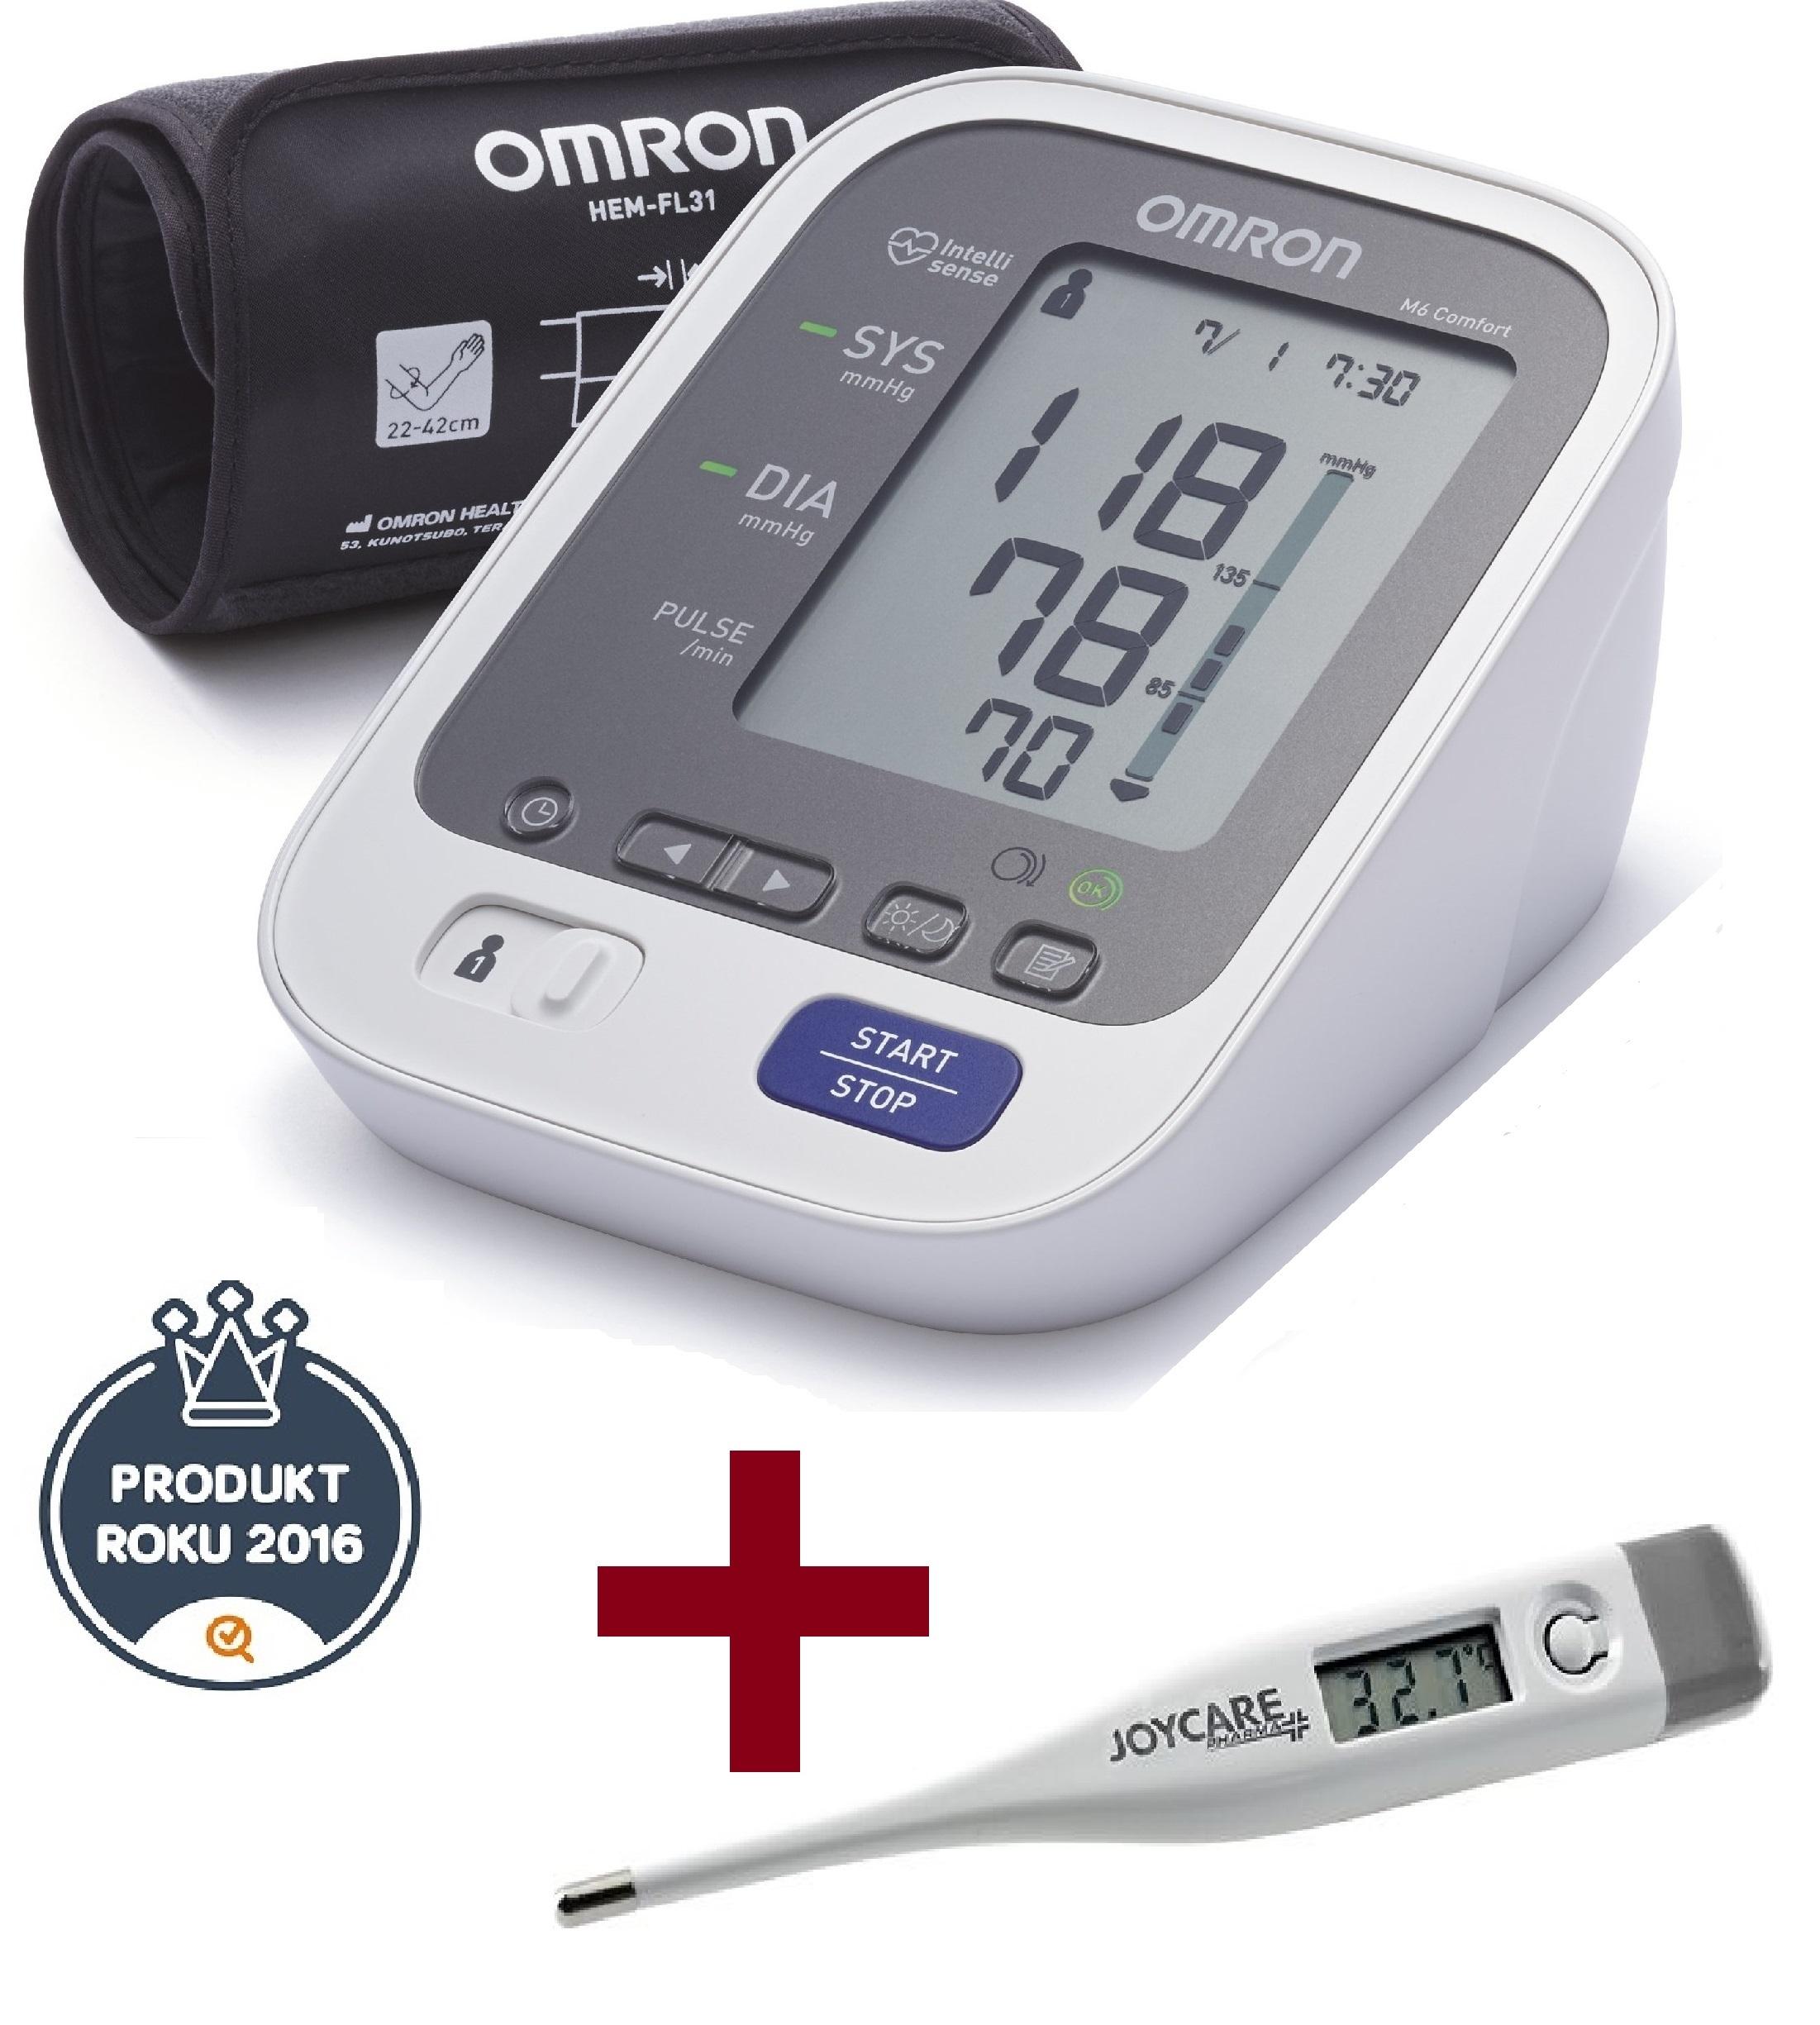 Tlakoměr OMRON M6 Comfort s Intelli manžetou - 3 roky záruka